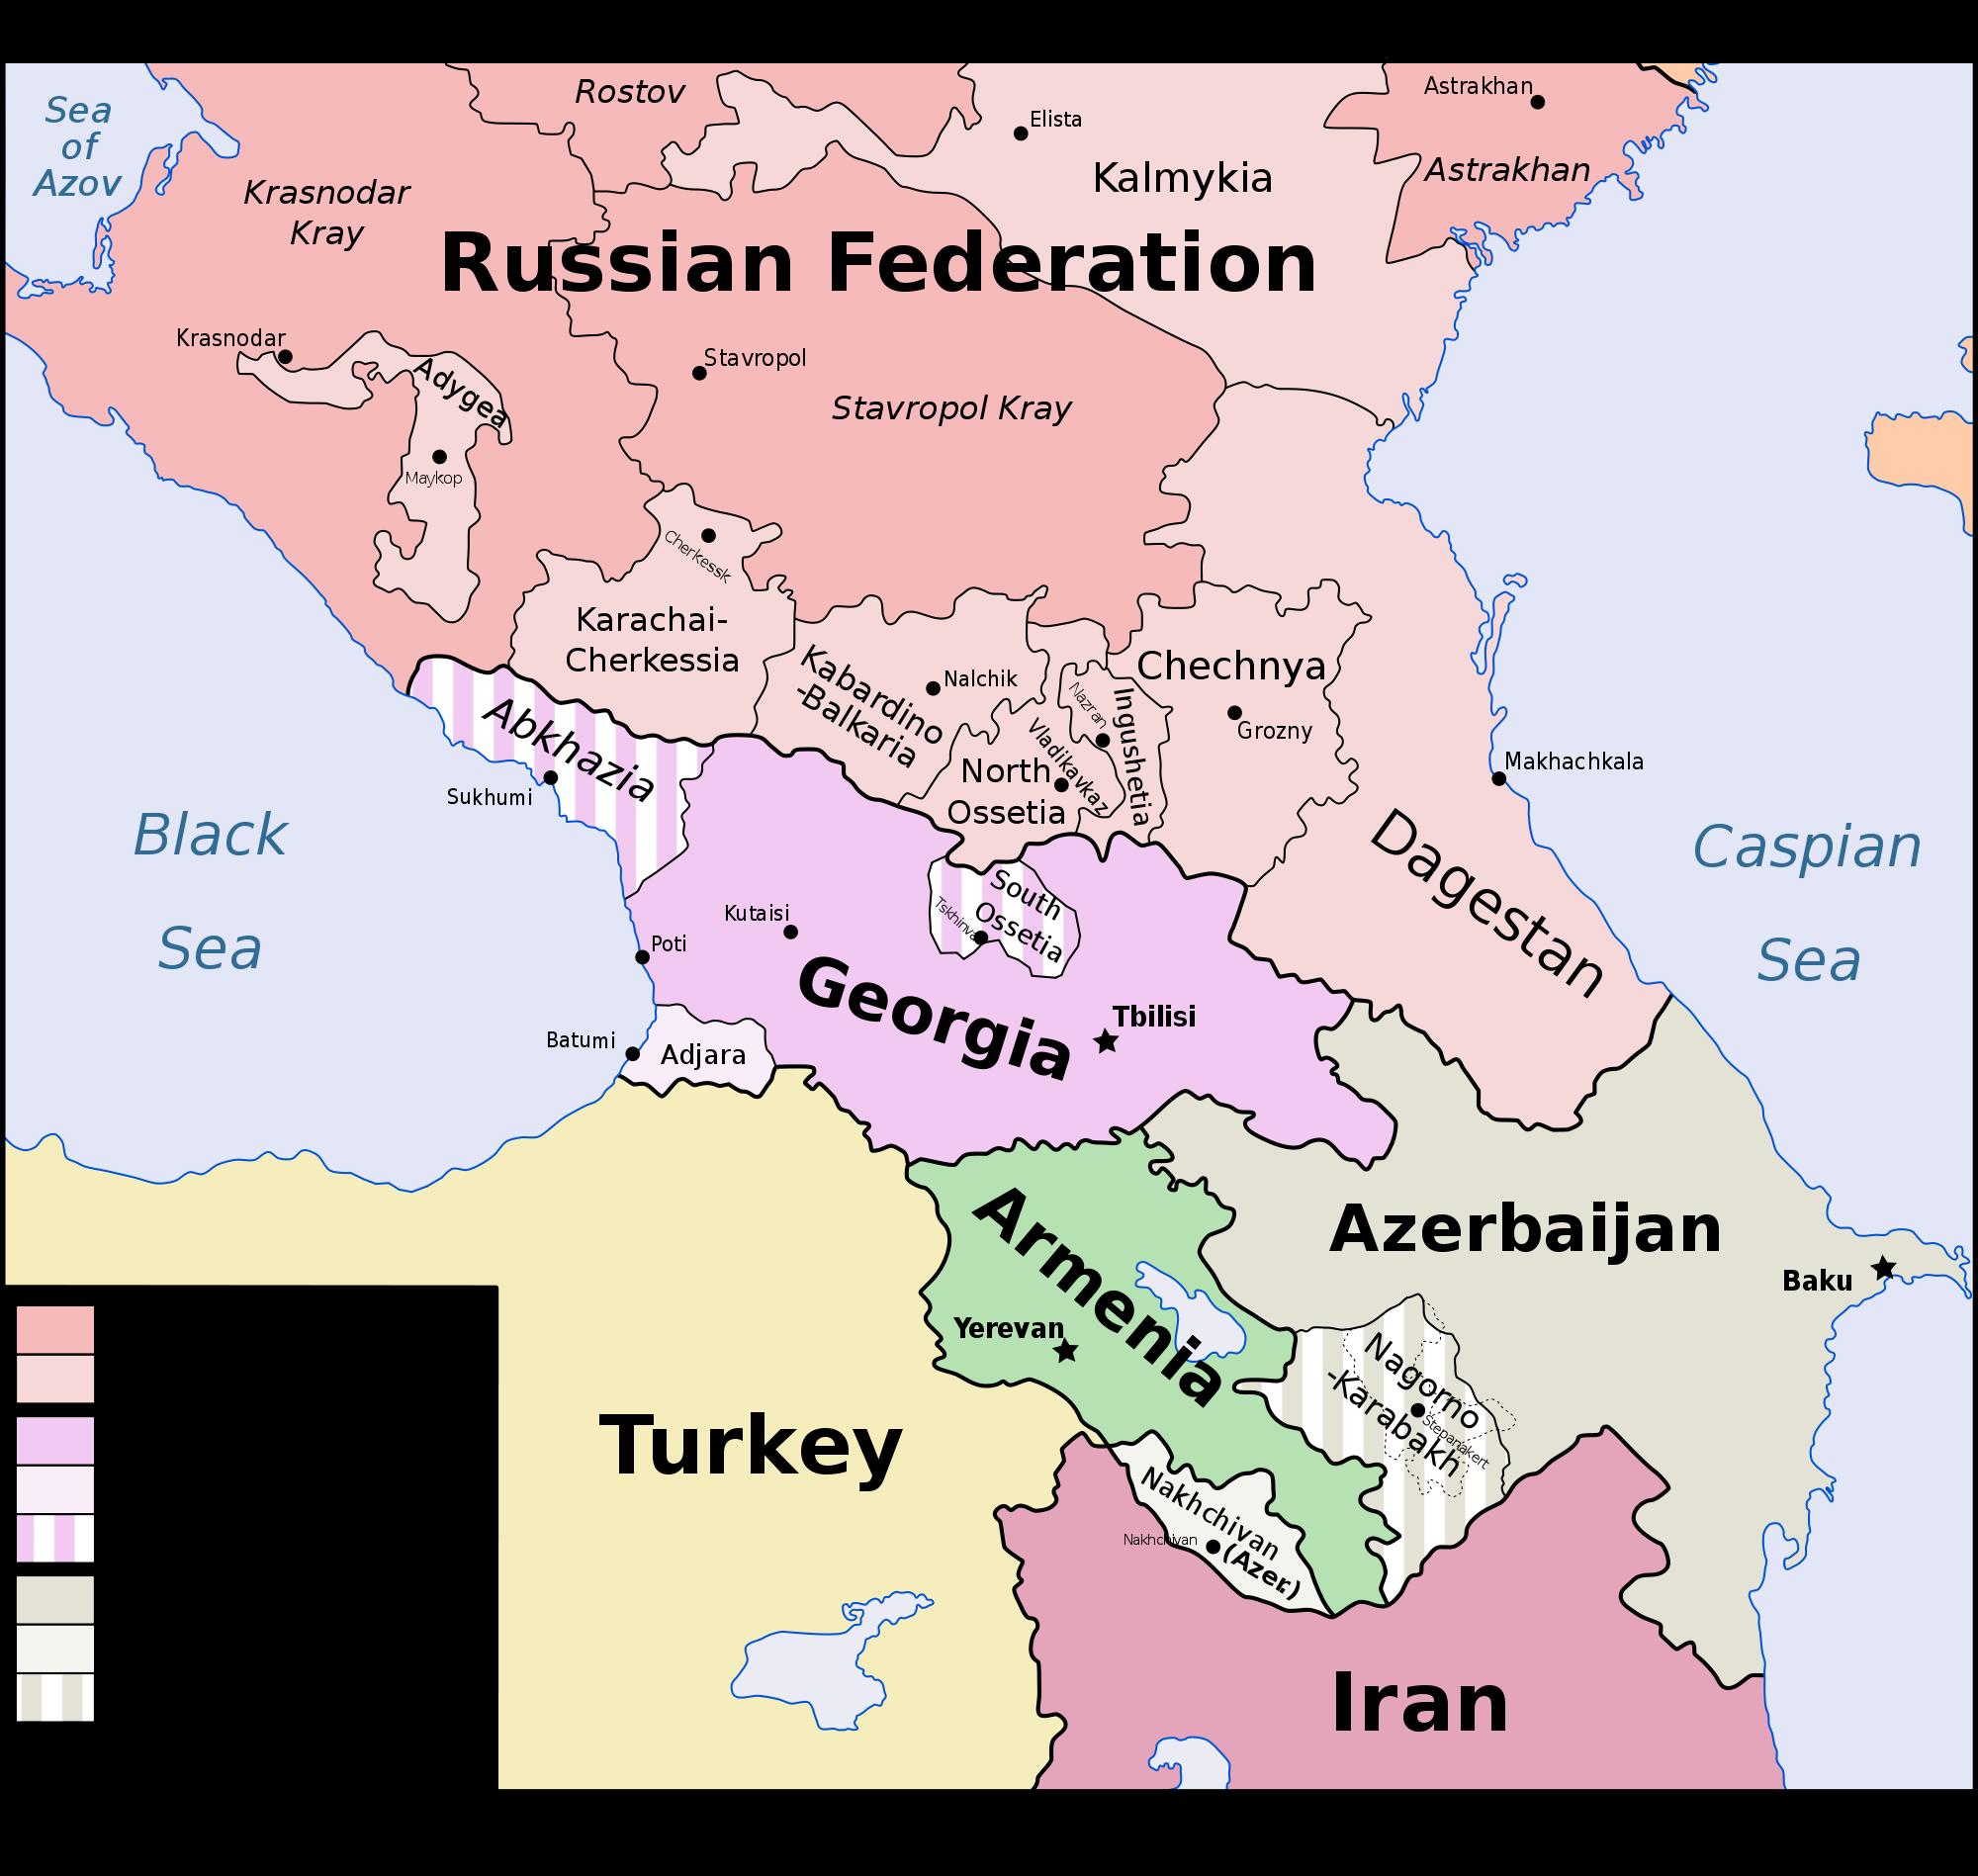 Geopolitical-Map-of-the-Caucasus